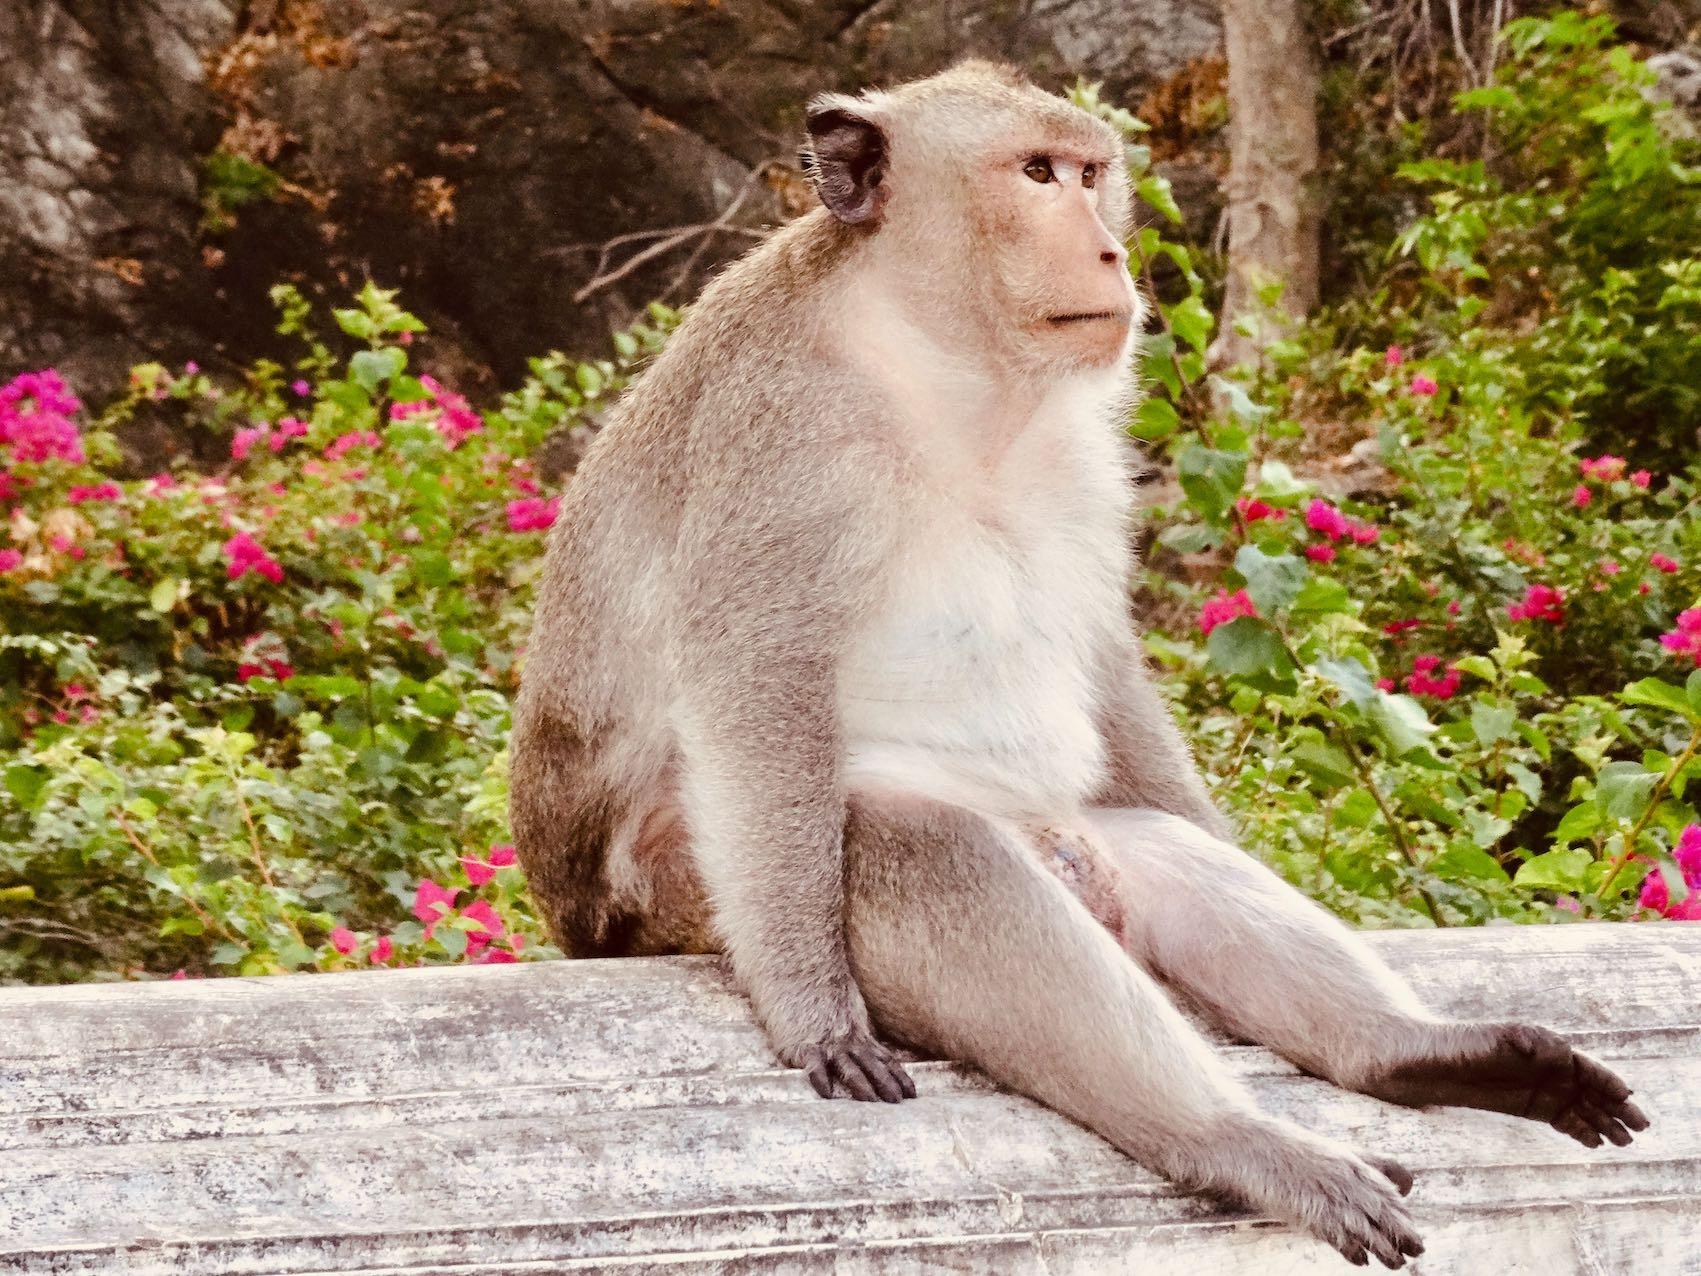 Phetchaburi Thailand the Monkey city